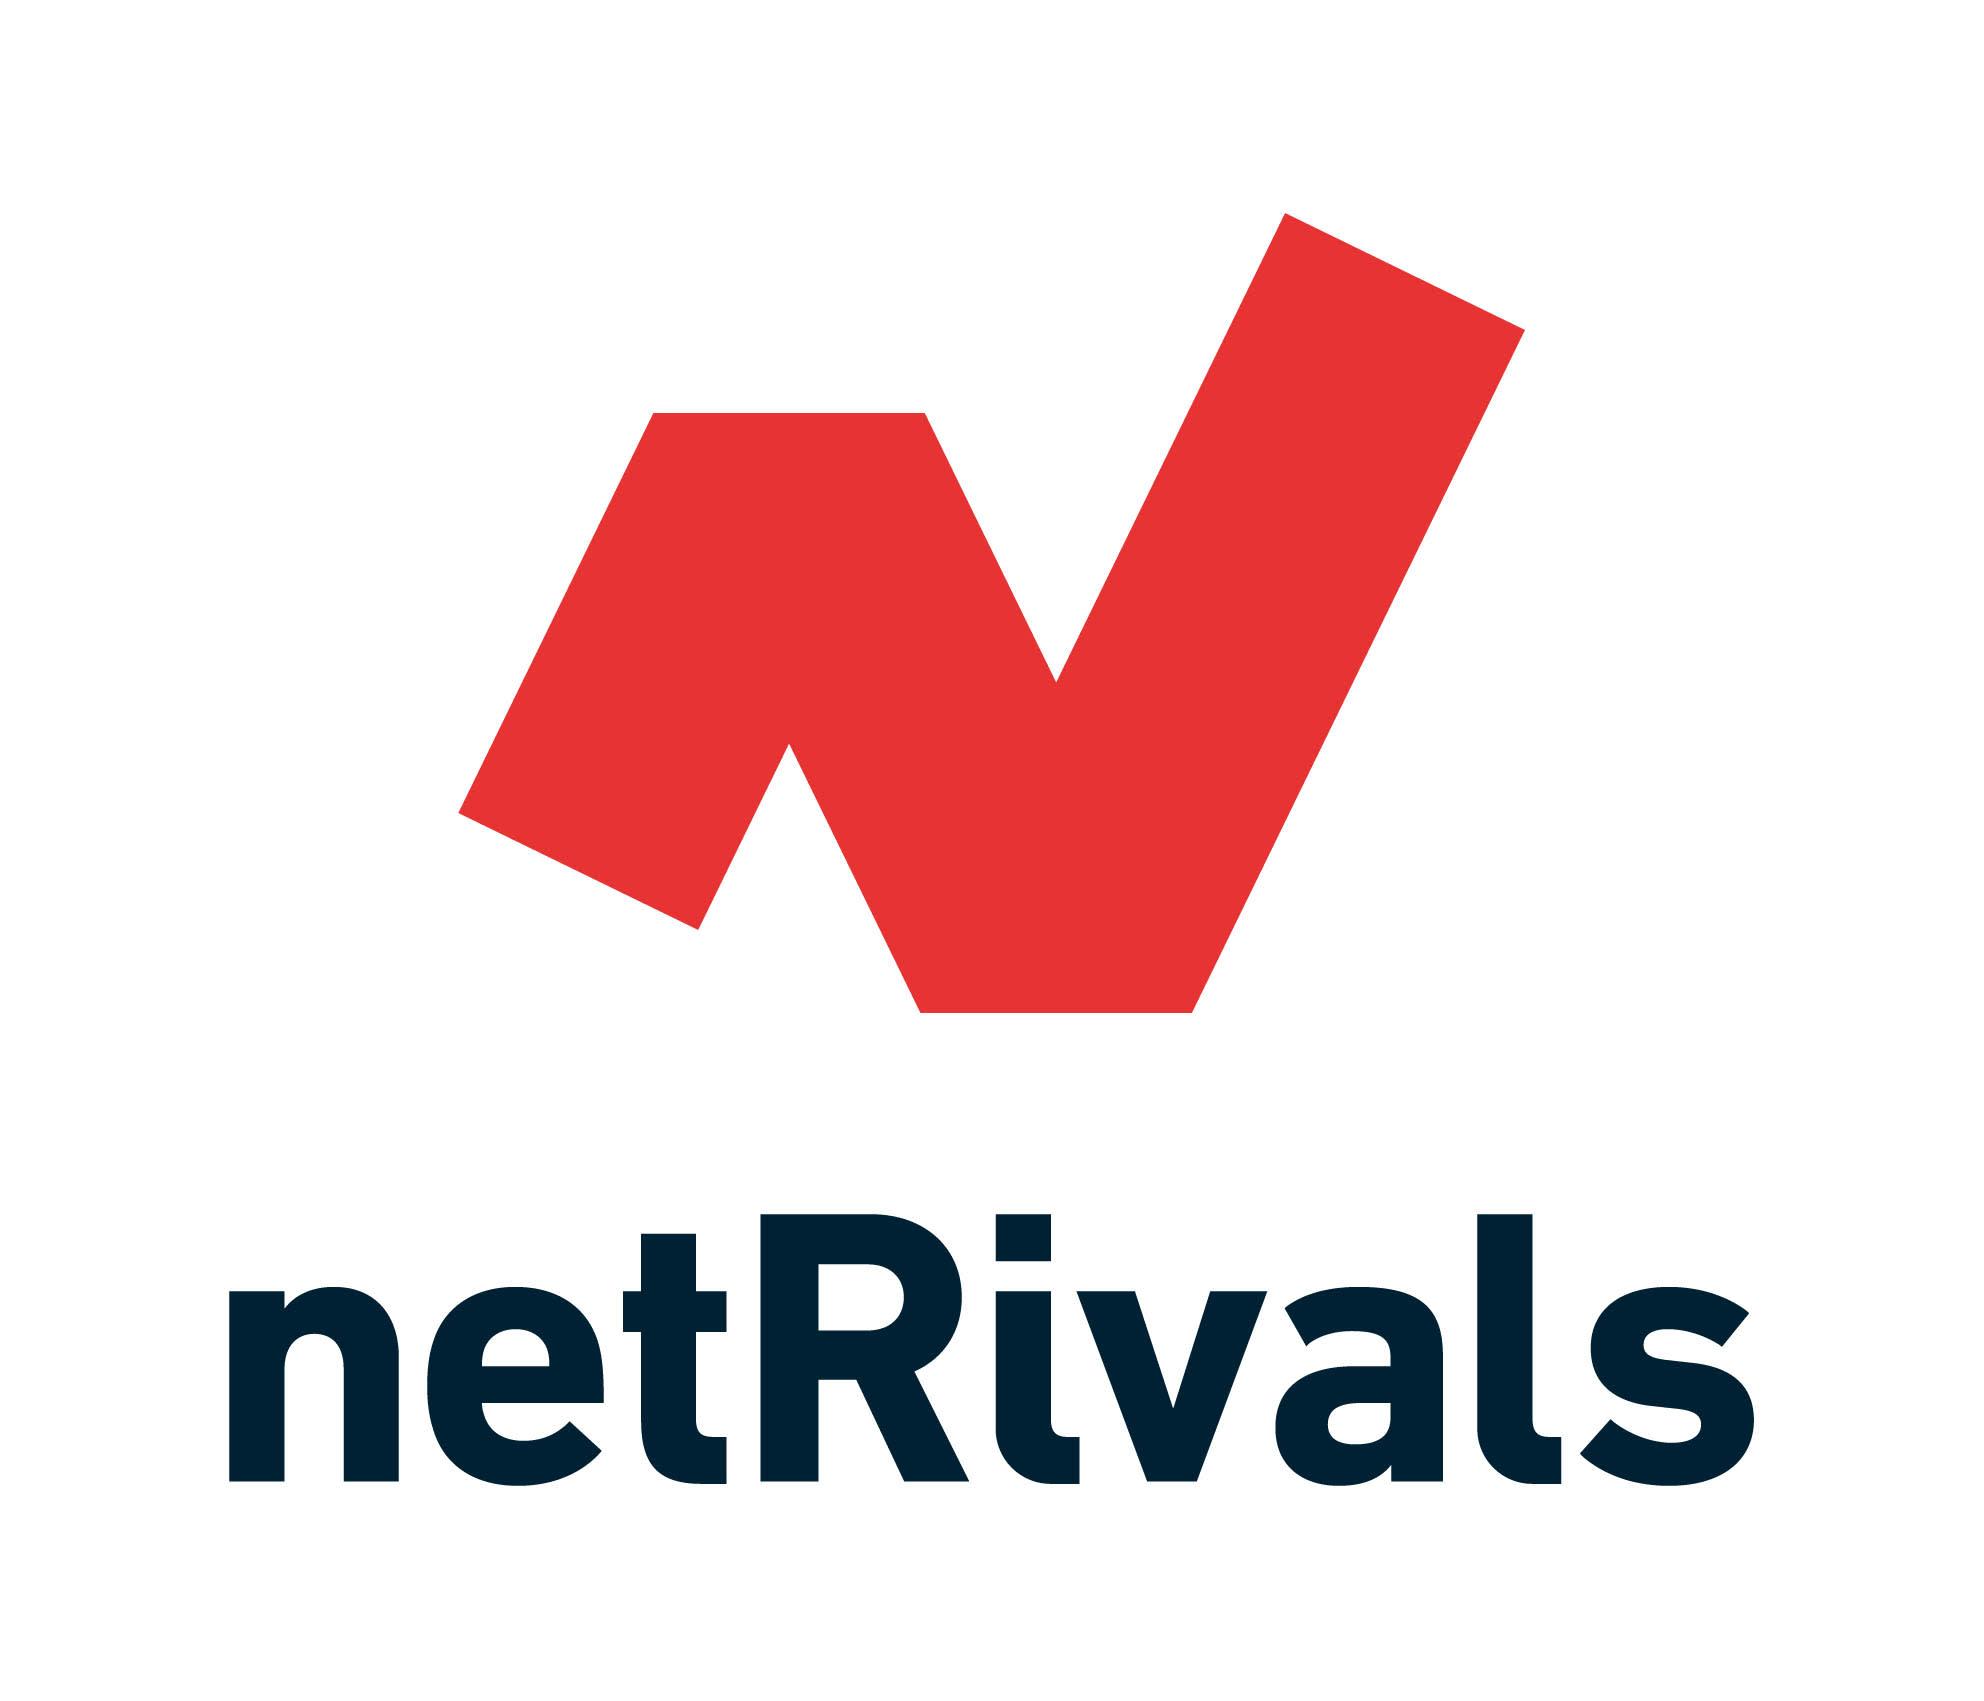 NetRivals's logo